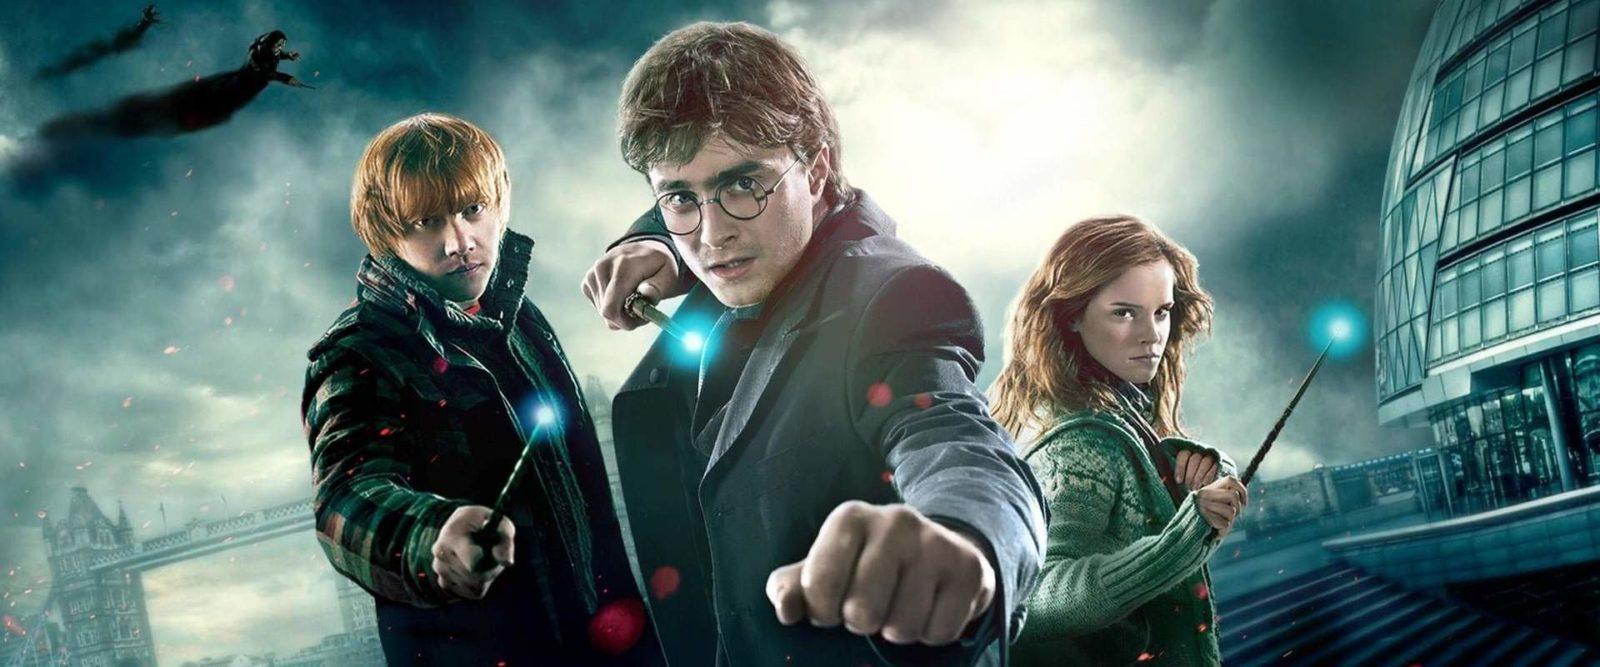 Волшебную палочку Гарри Поттера продадут на аукционе